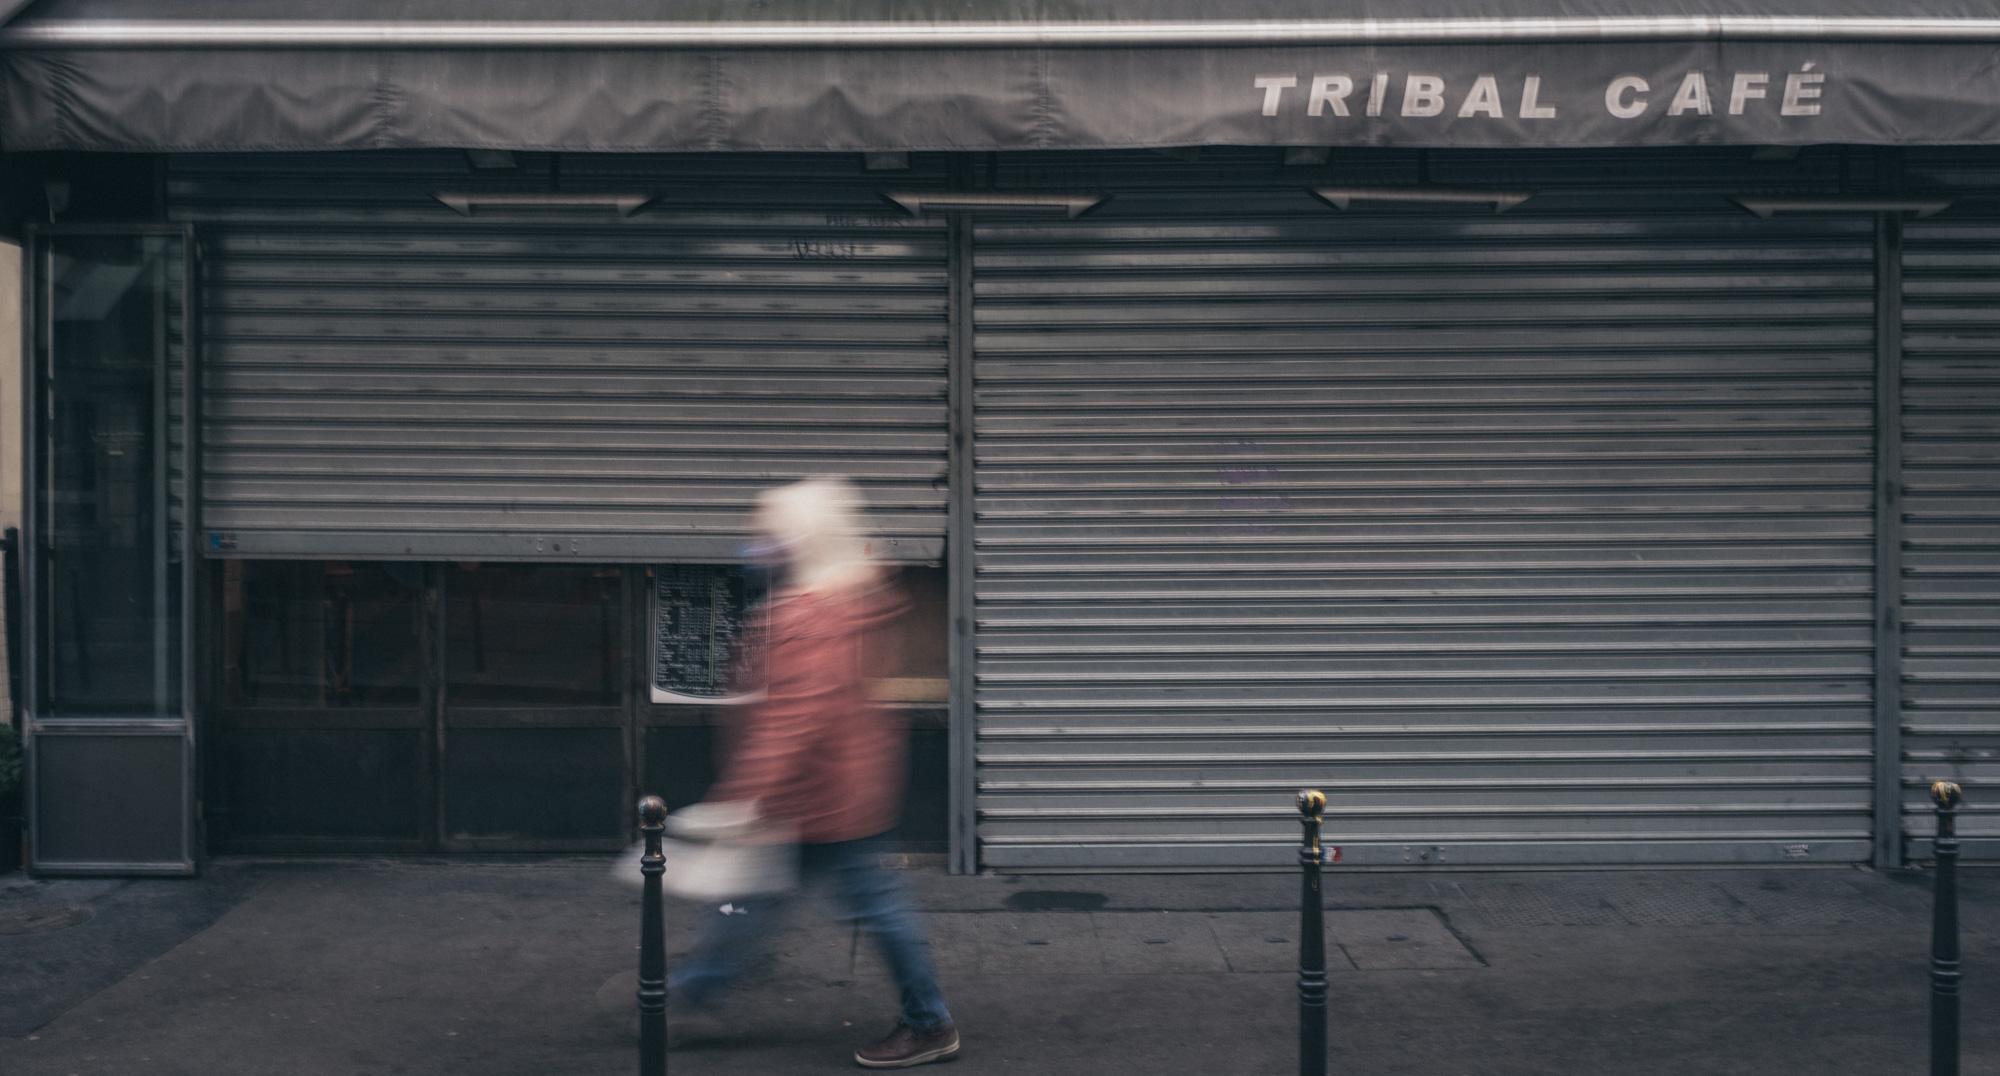 Tribal Café. Covid side effects in Paris.